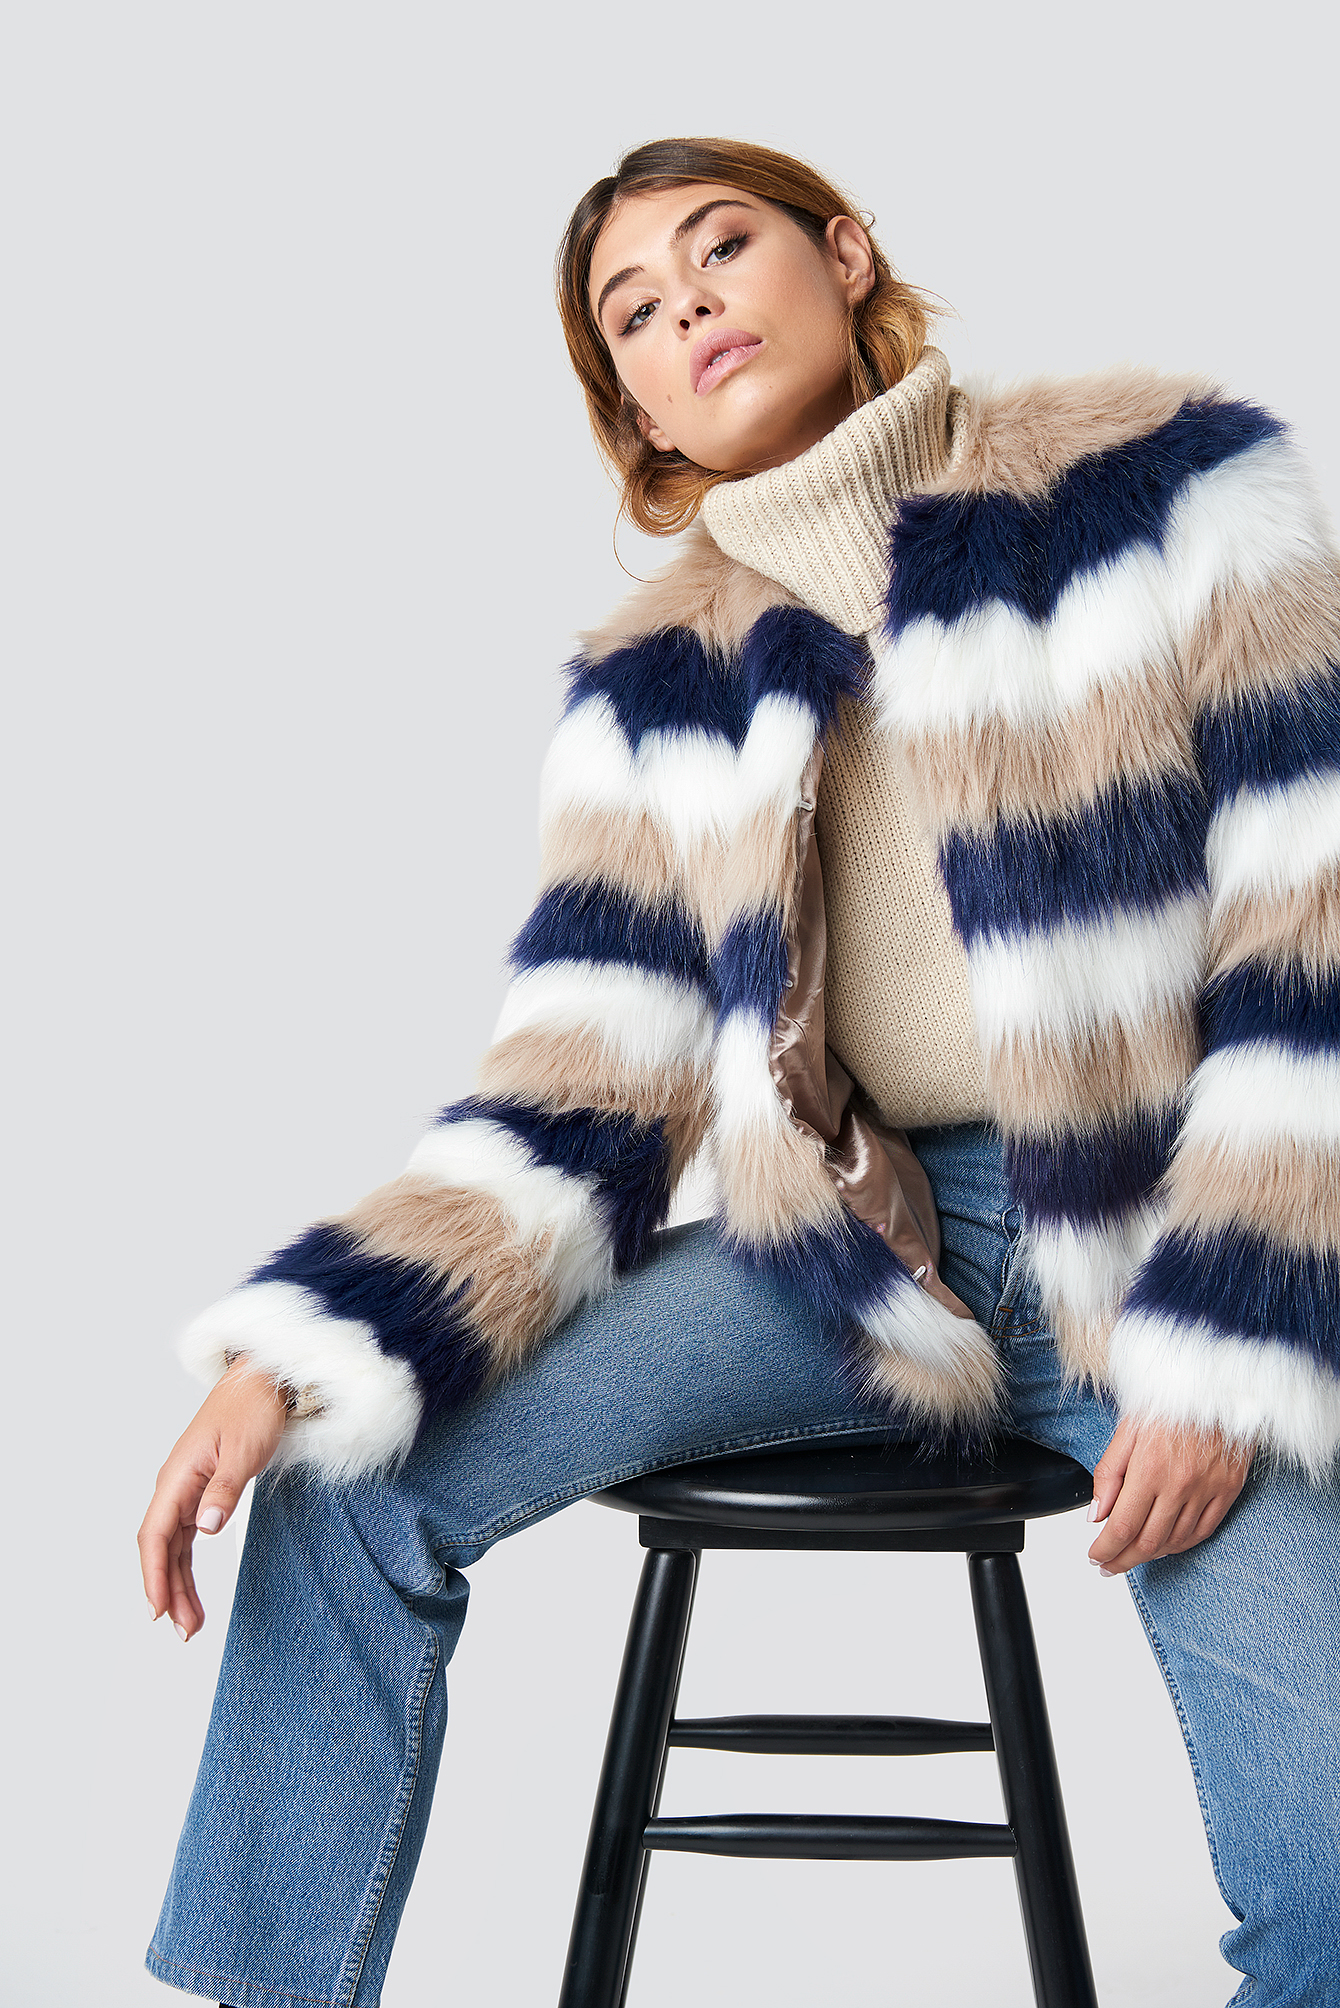 linn ahlborg x na-kd -  Striped Faux Fur Jacket - Beige,Blue,Multicolor